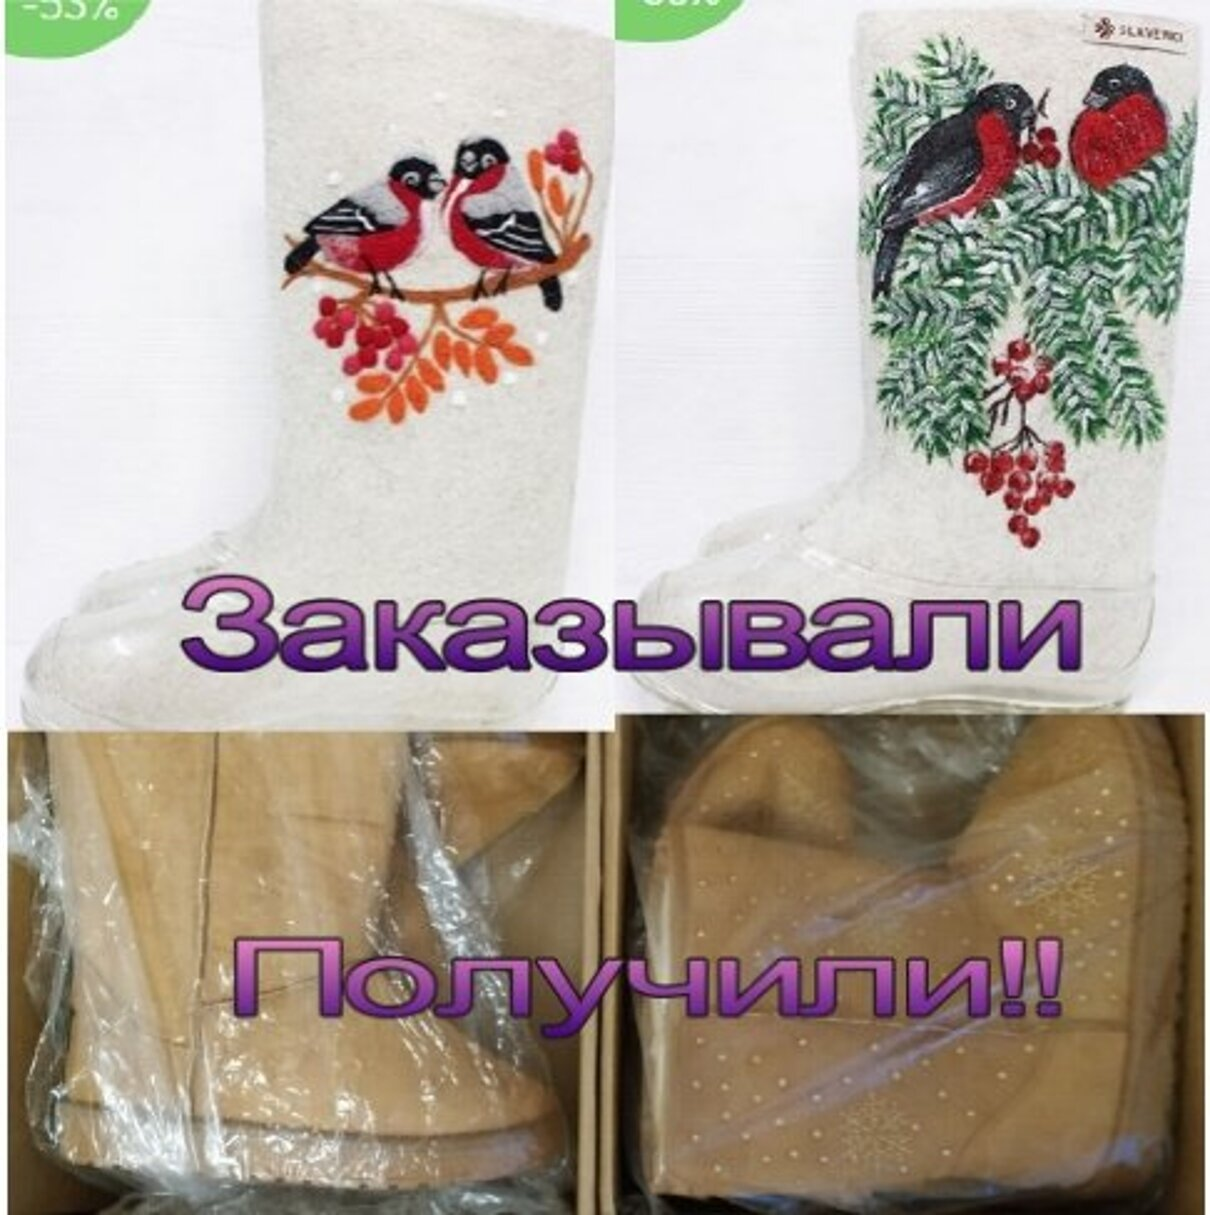 Жалоба-отзыв: Valenki Style интернет магазин - Мошенничество.  Фото №3